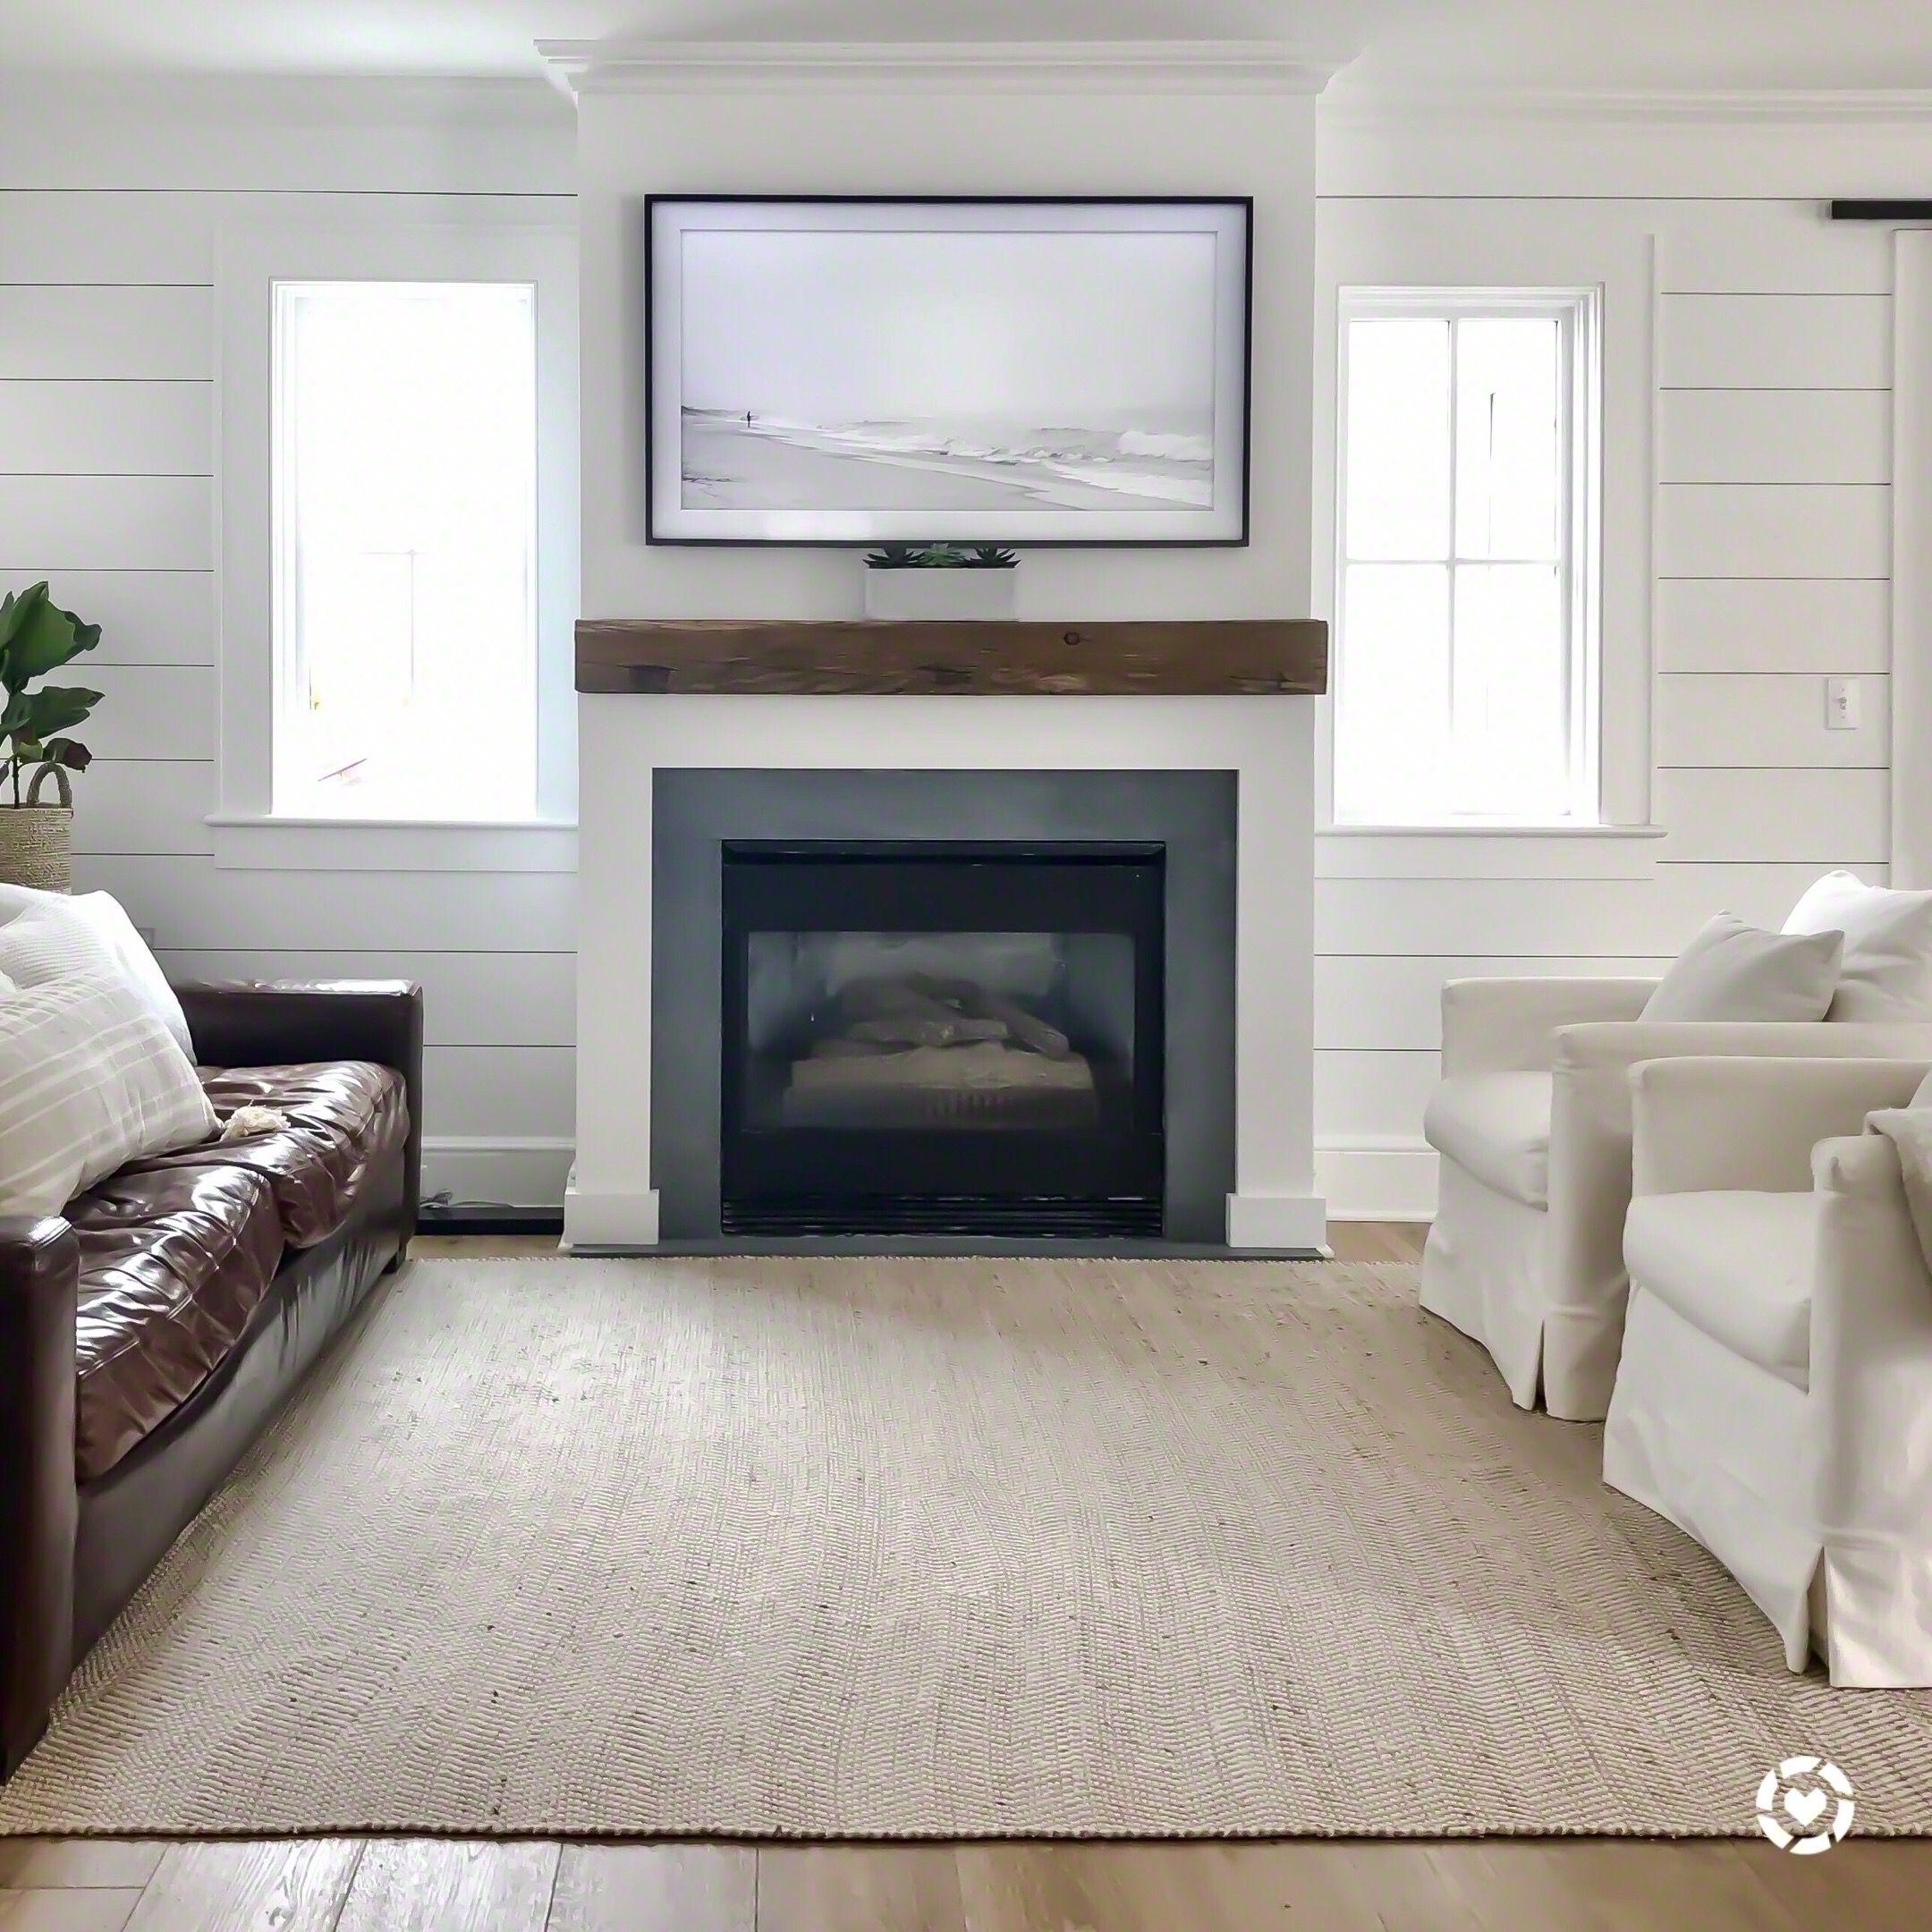 Coastal Living Room Reclaimed Beam Fireplace Surround Shiplap Samsung The Frame Tv Coastal Living Rooms Home Fireplace Fireplace Surrounds